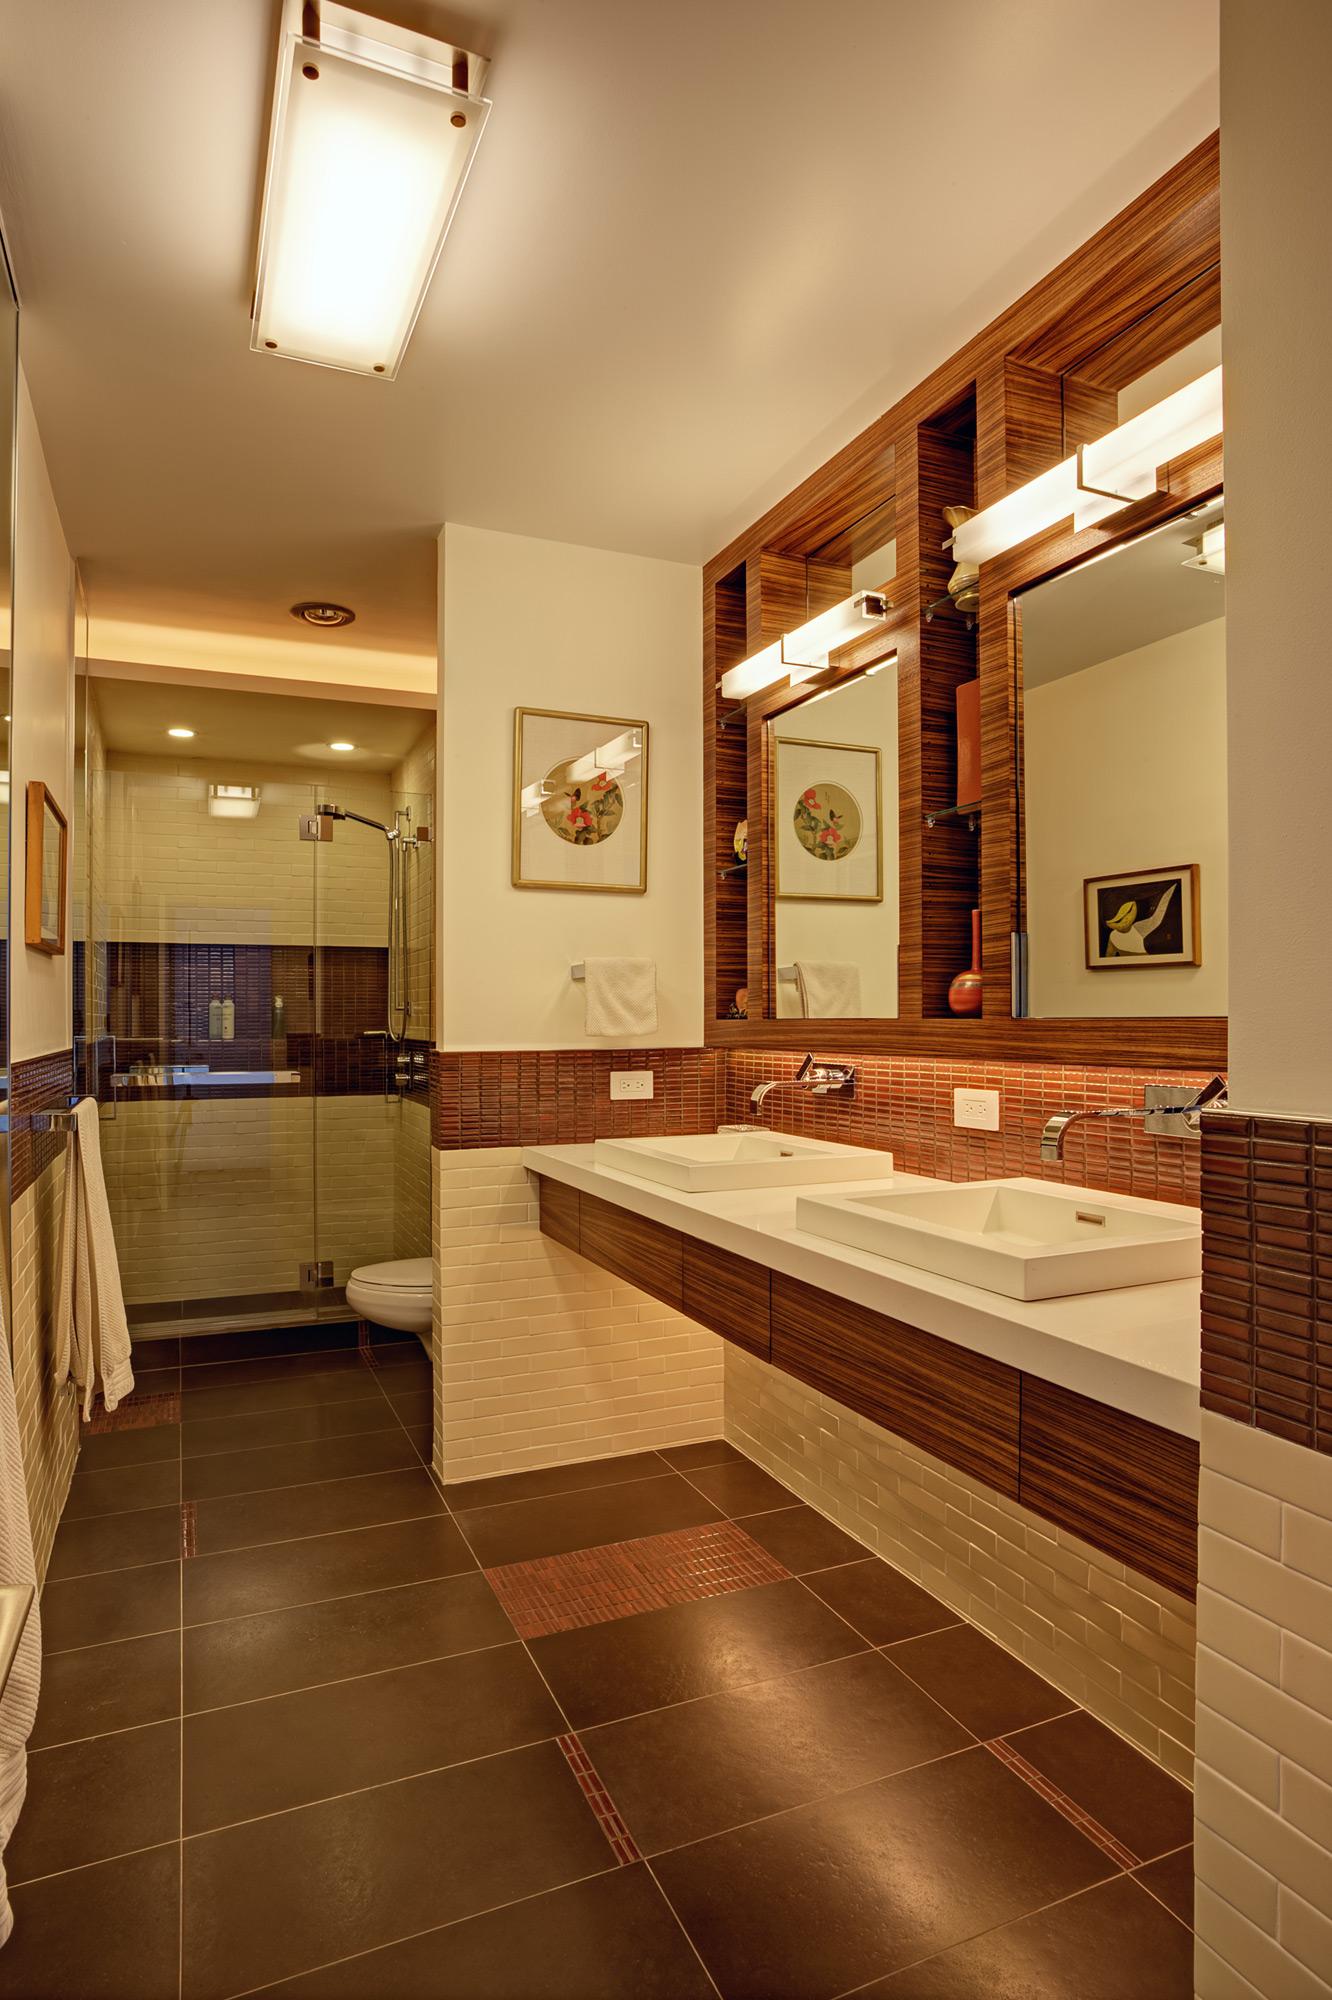 Kaplan-Architects-high-rise-interior-master-bathroom-vanity-and-shower.jpg